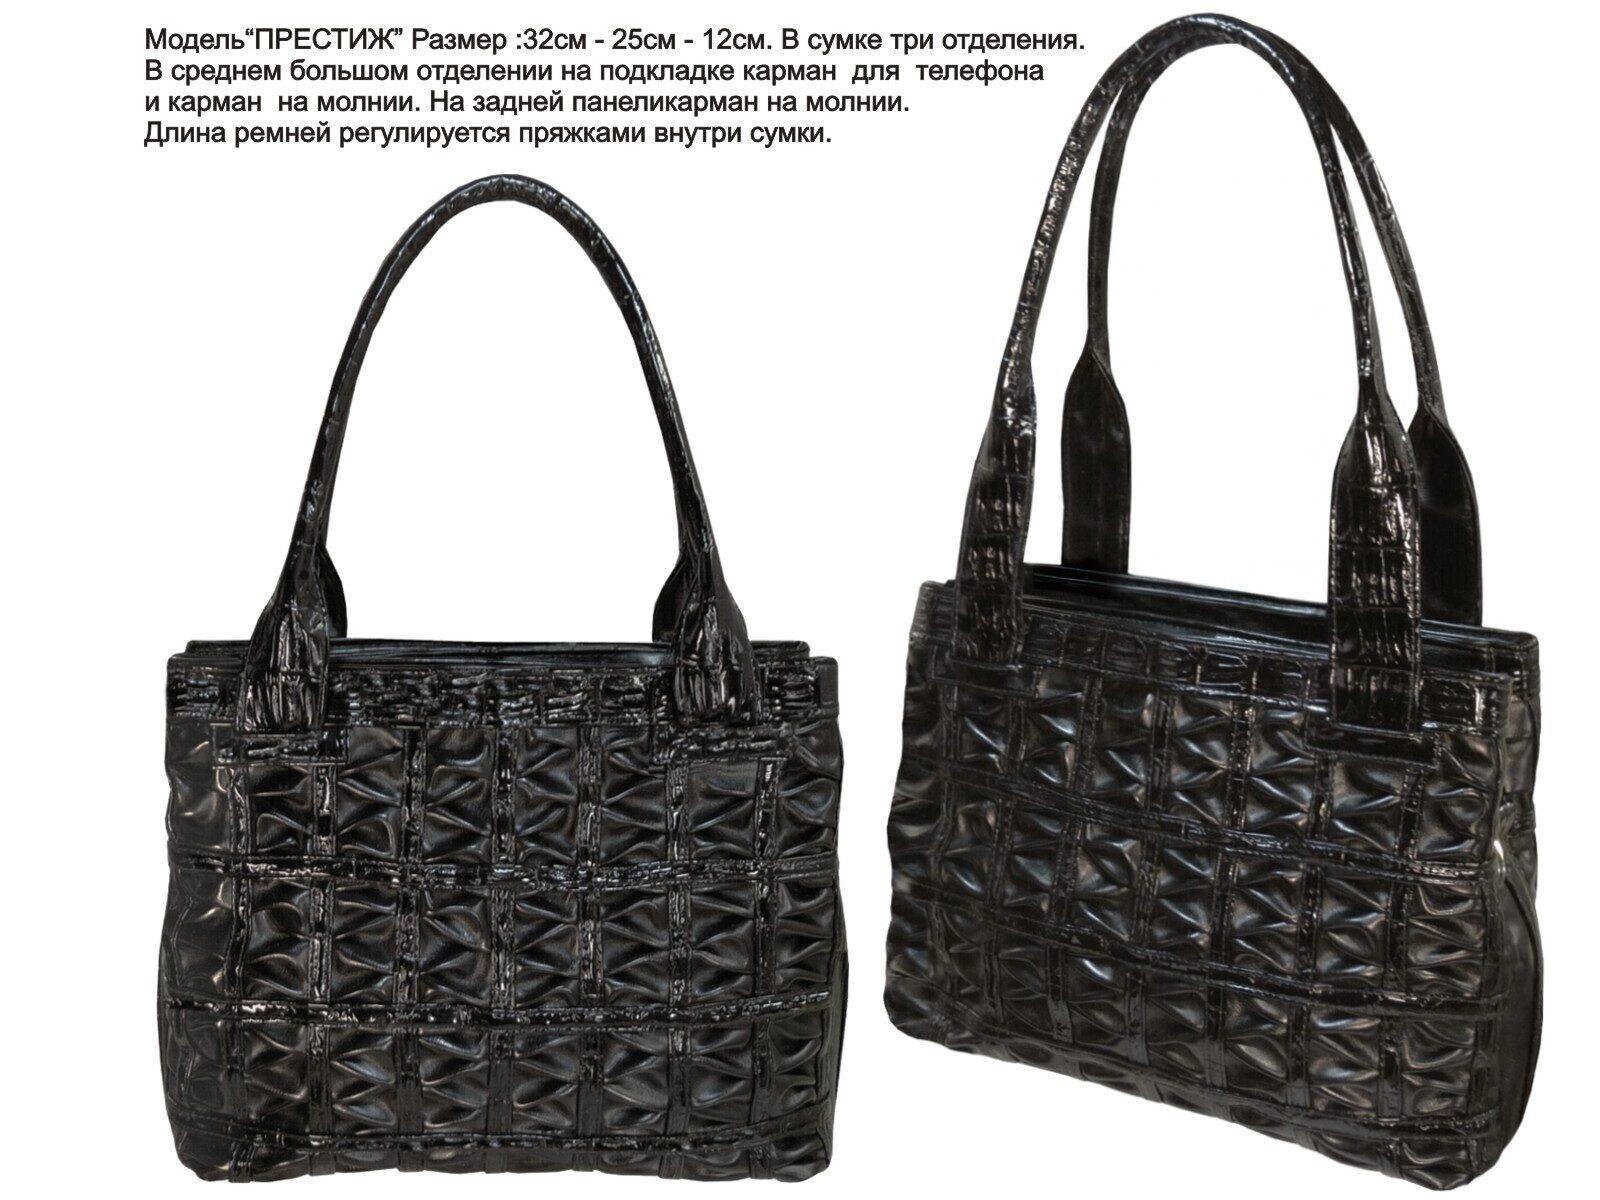 ca3550425a65 Женская сумка